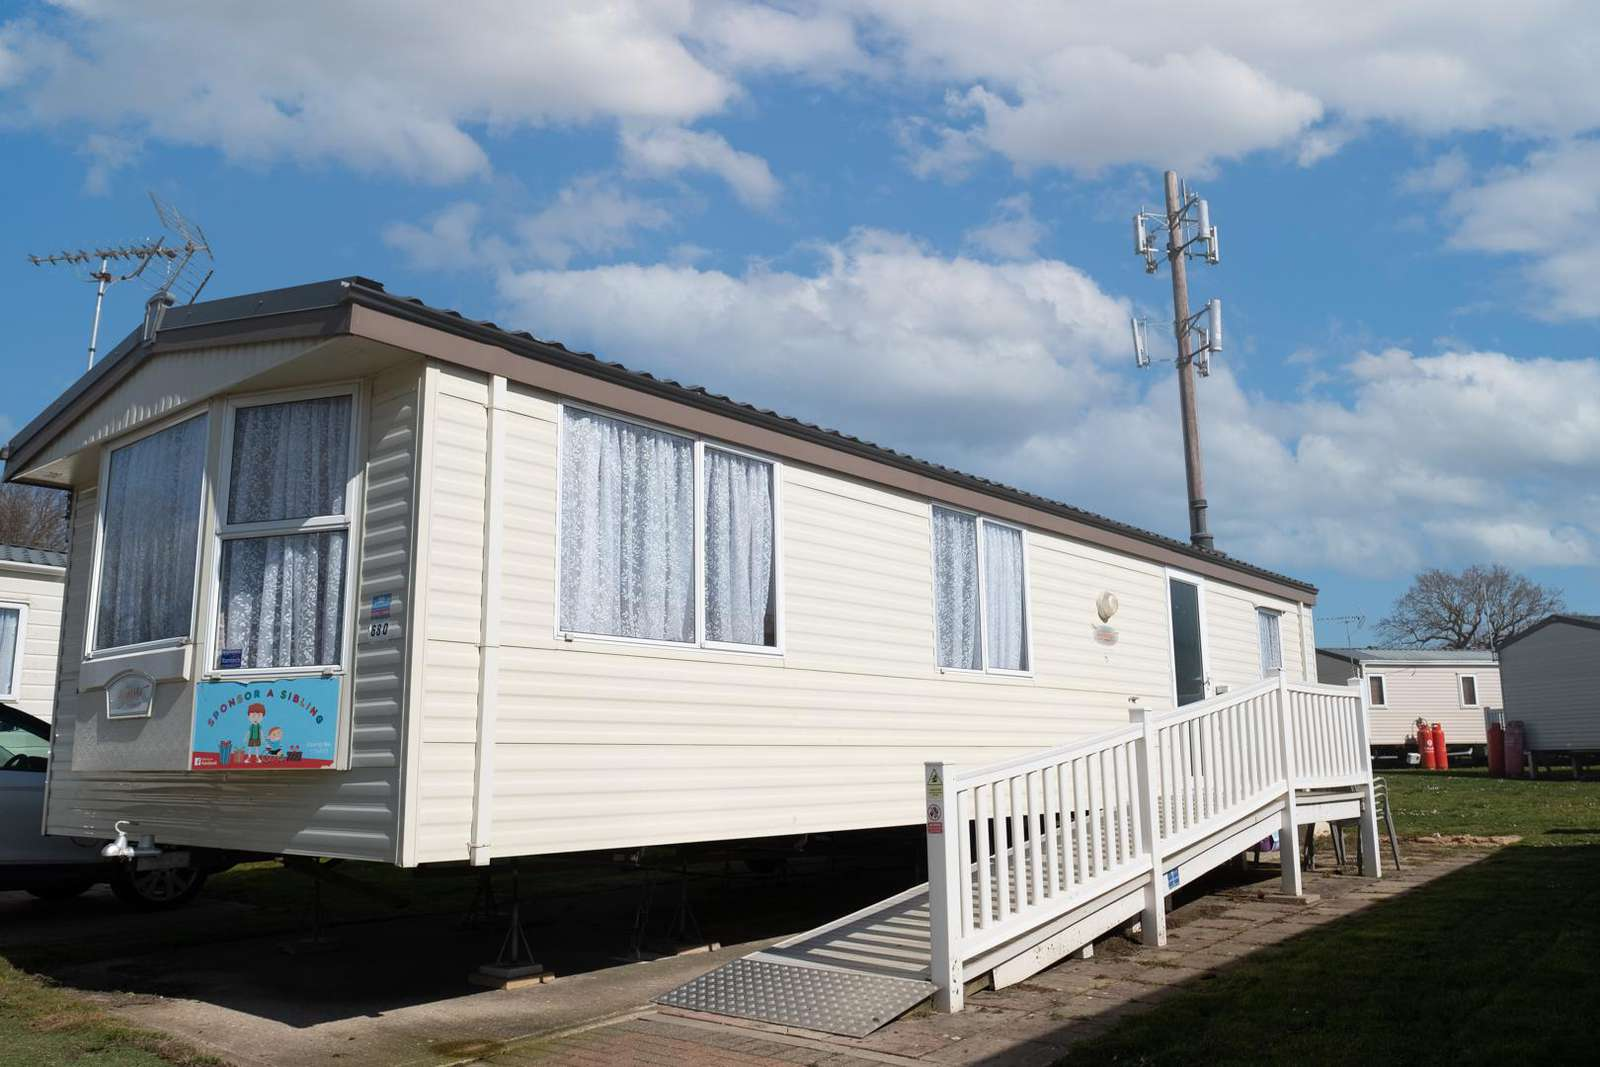 26680P – Poplars area, 2 bed, 6 berth wheelchair friendly caravan. Emerald rated. - property